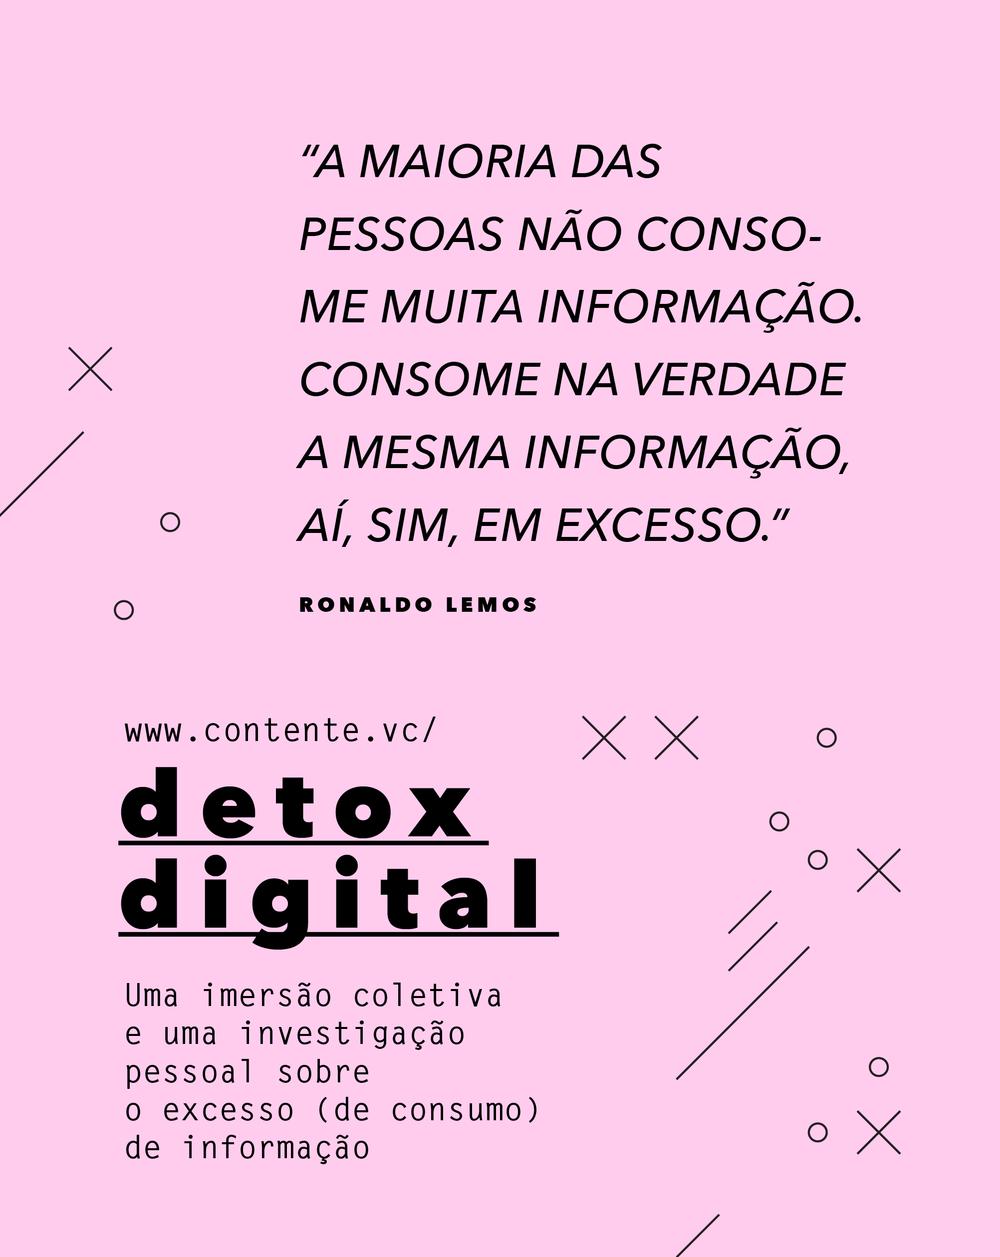 dettoxdigital-03.png